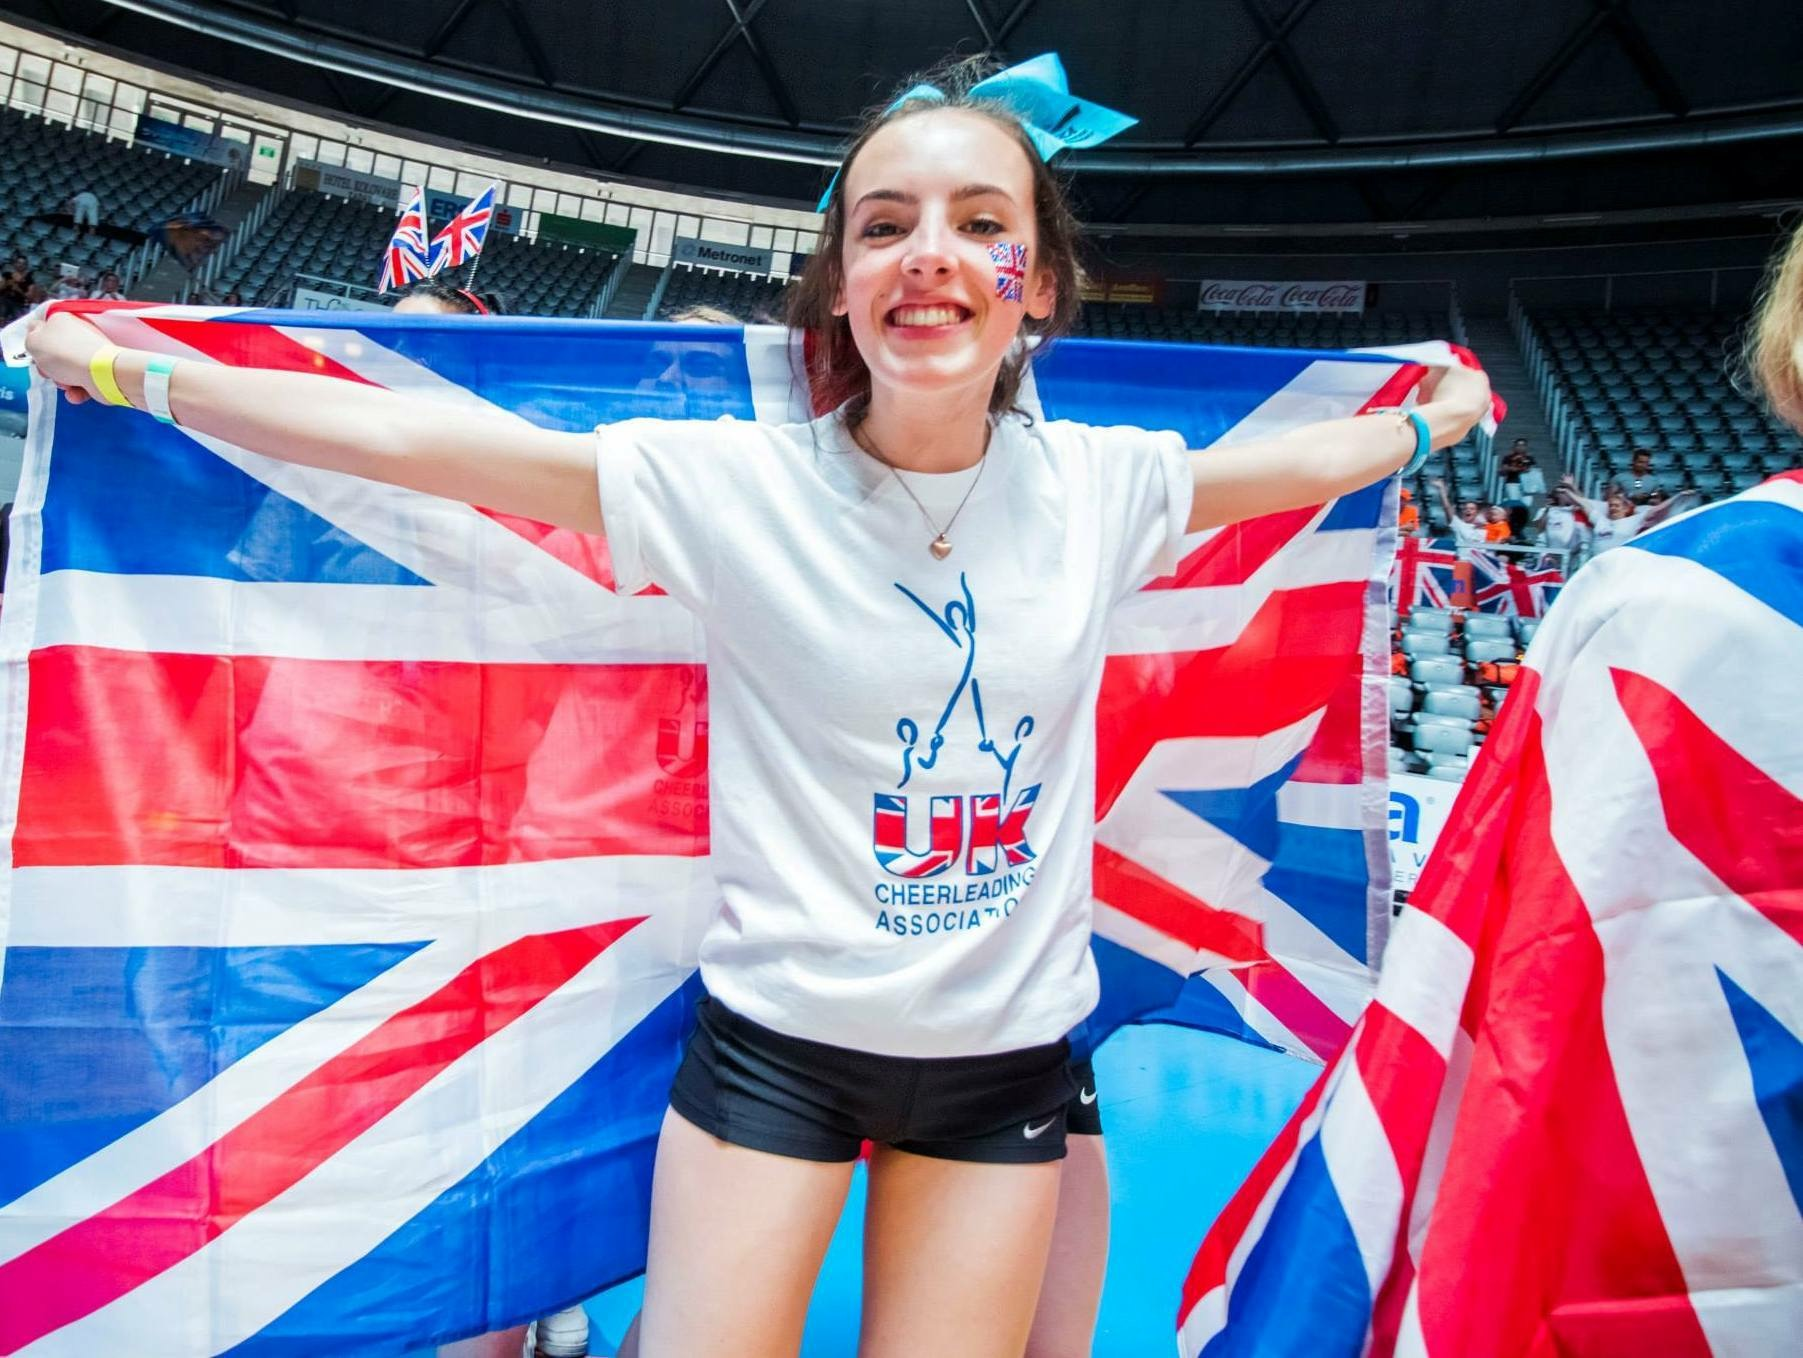 European Cheerleading Championships 2015 1.JPG